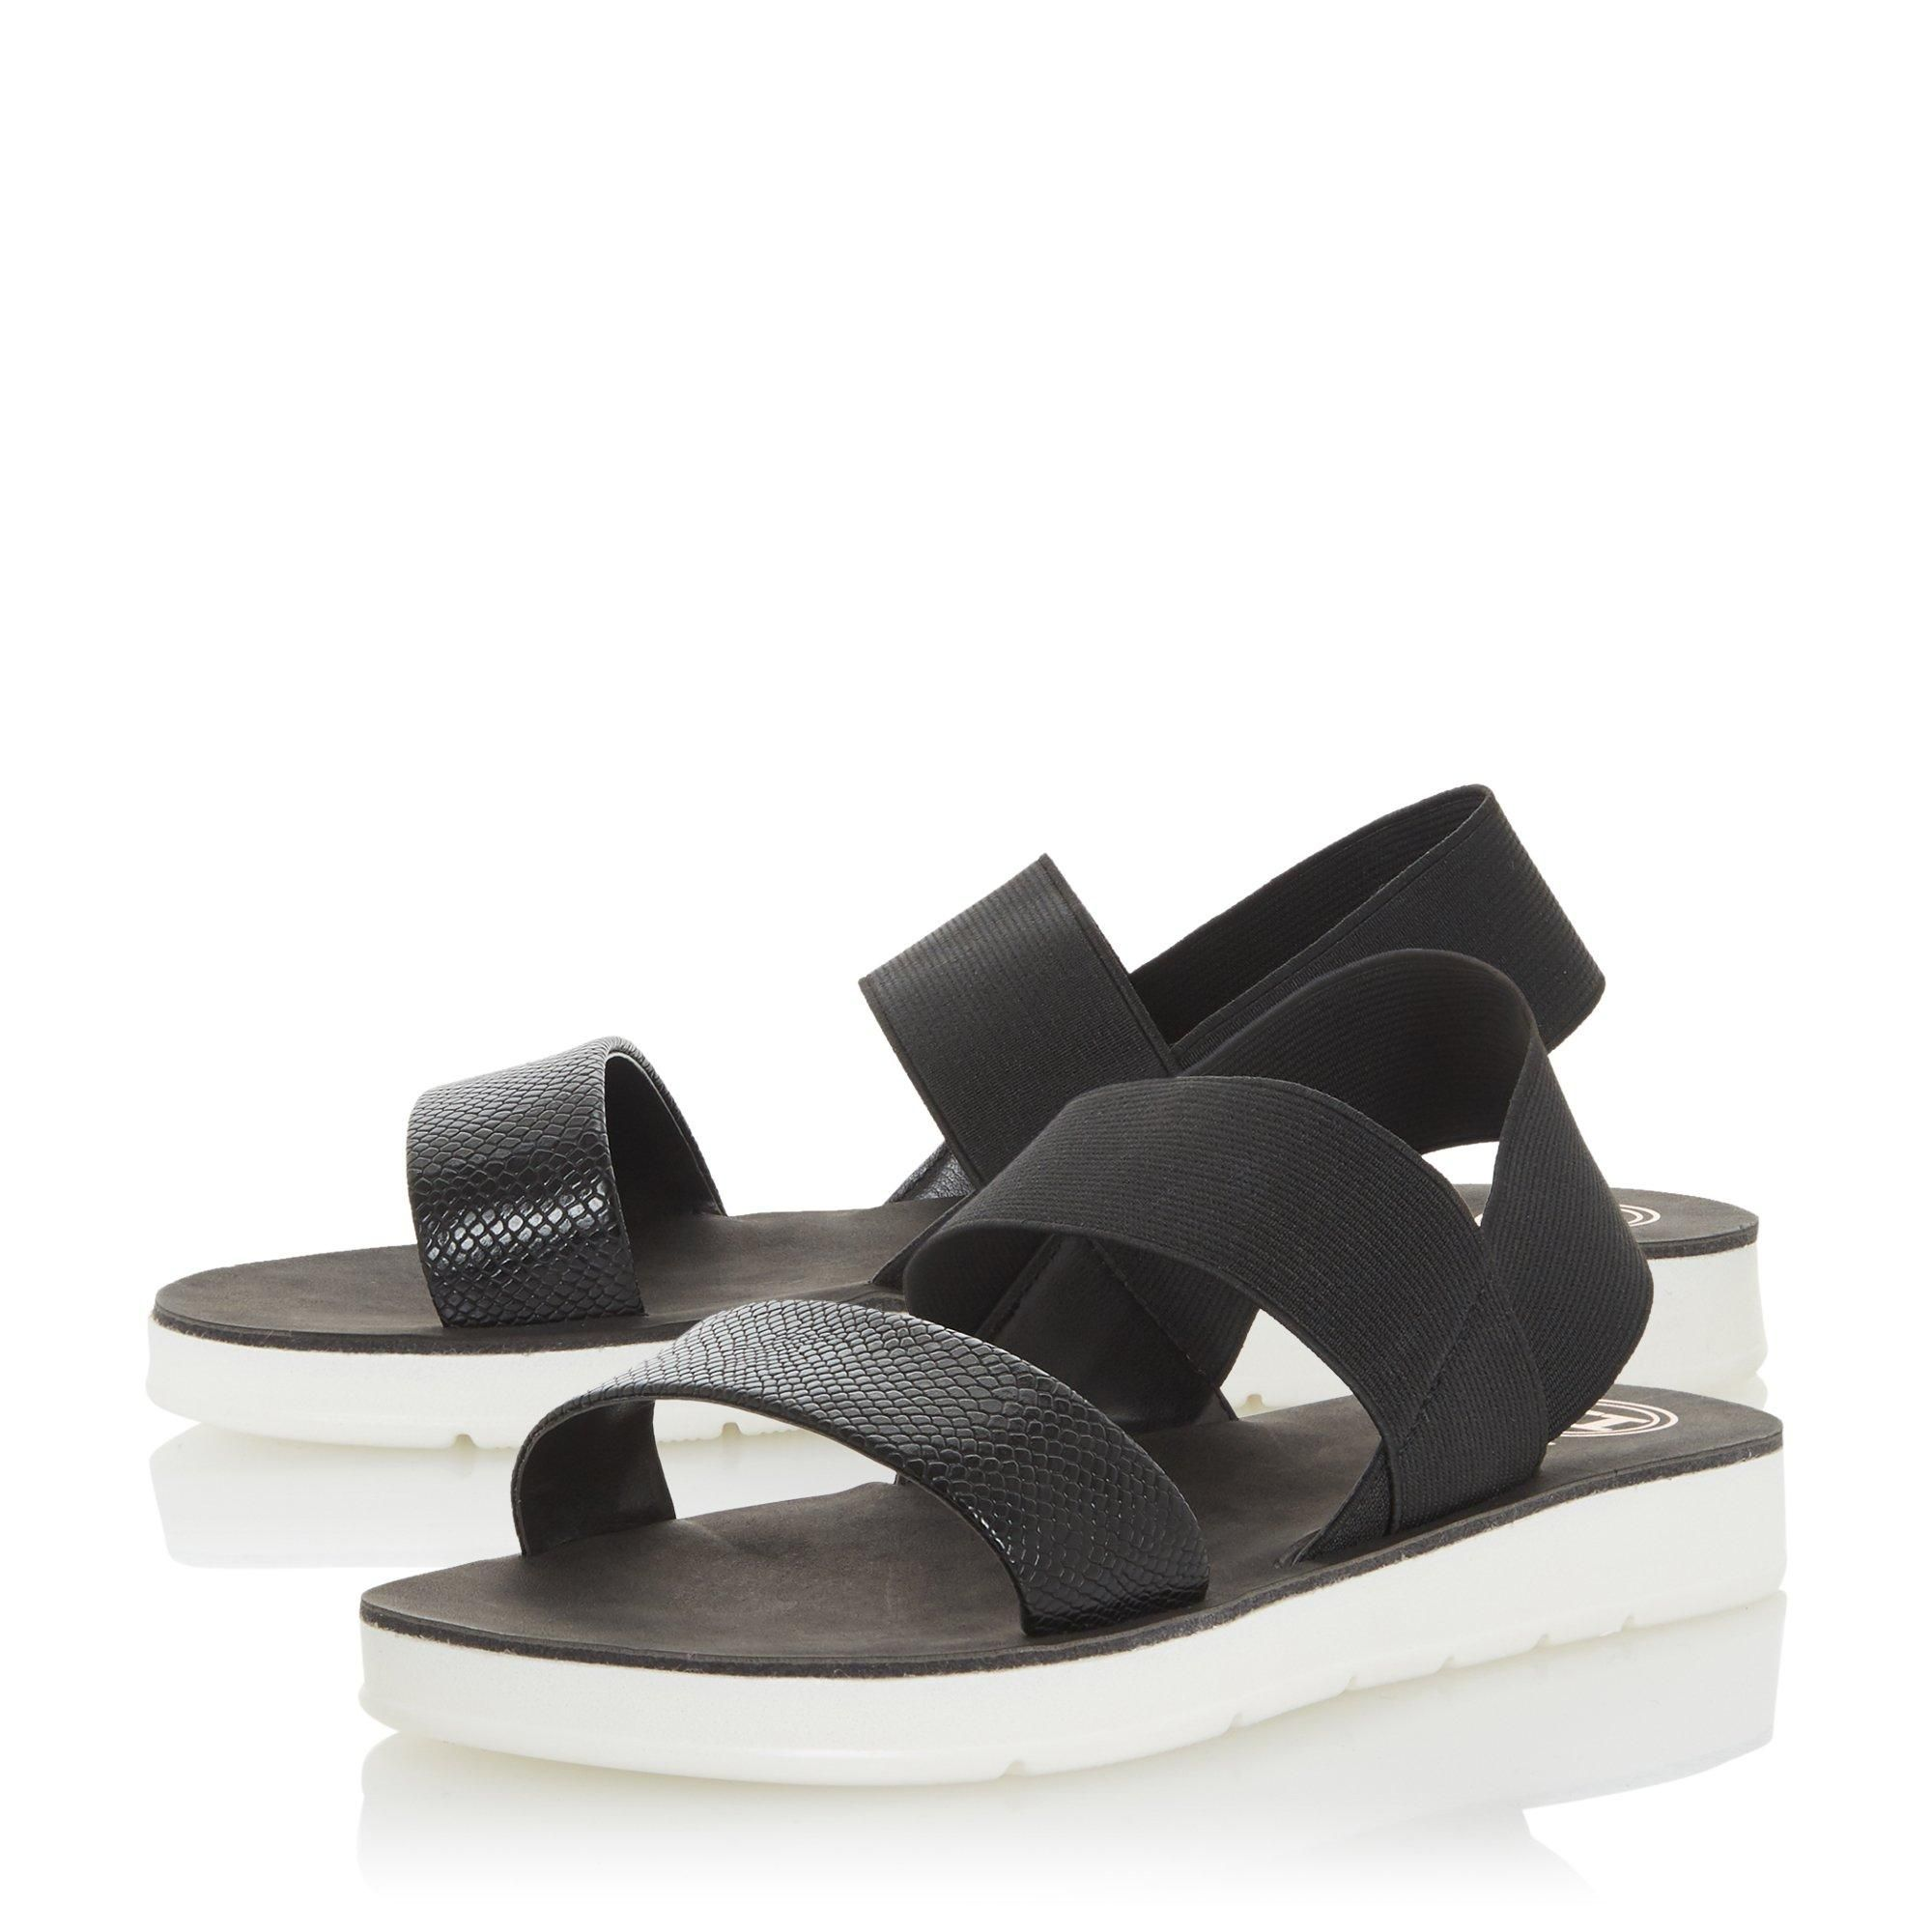 Dune Ladies LENIA Double Strap Slingback Sandals